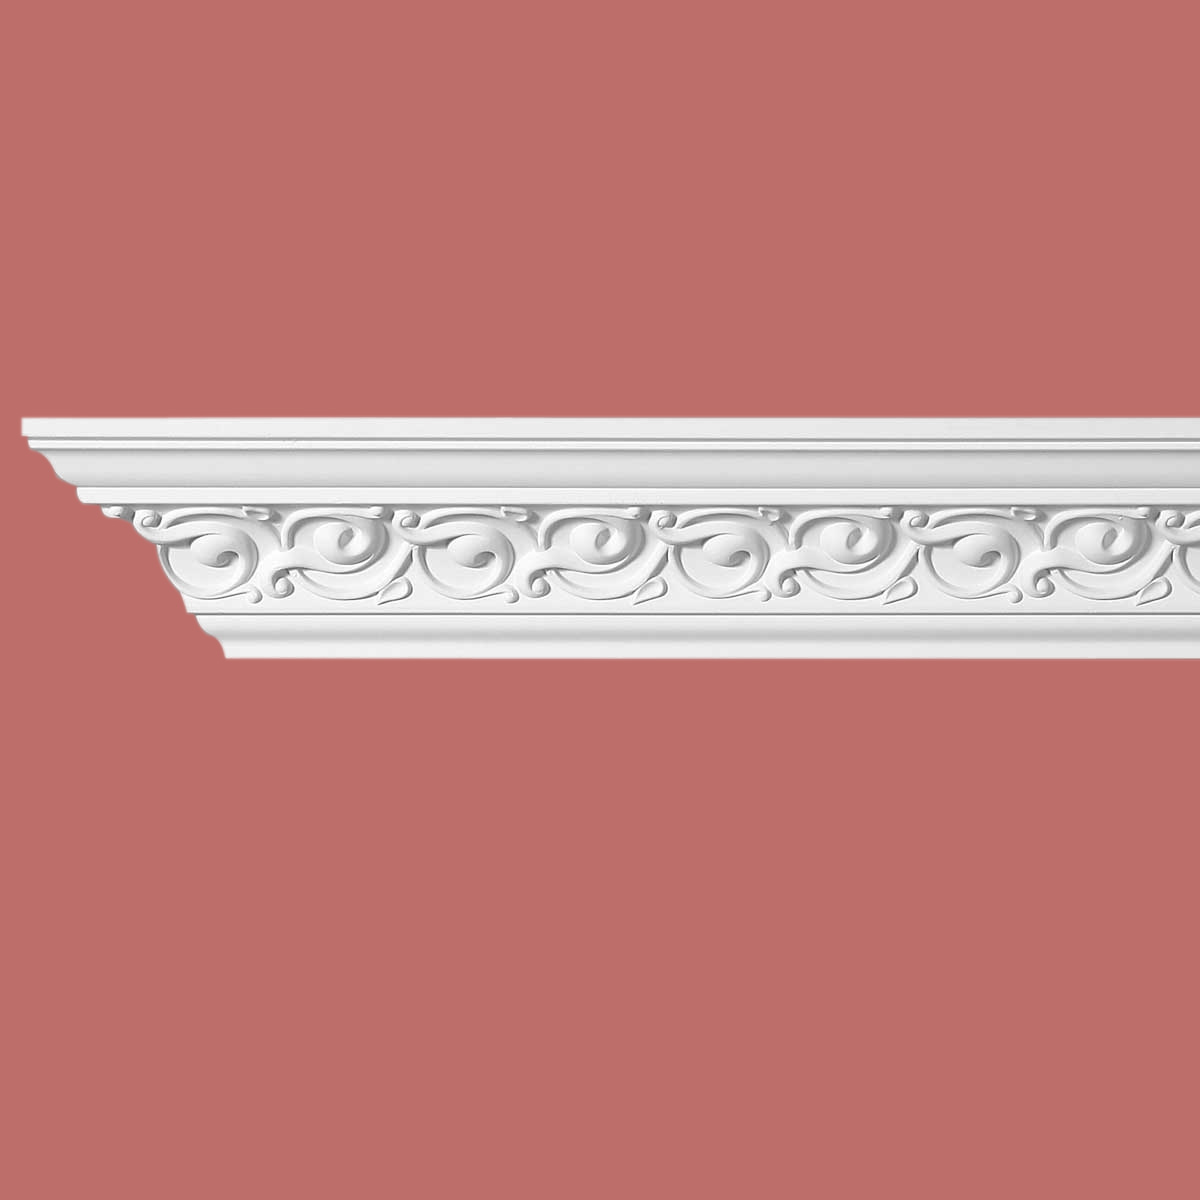 Cornice White Urethane Sample of 10989 23.5 Long Cornice Cornice Moulding Cornice Molding